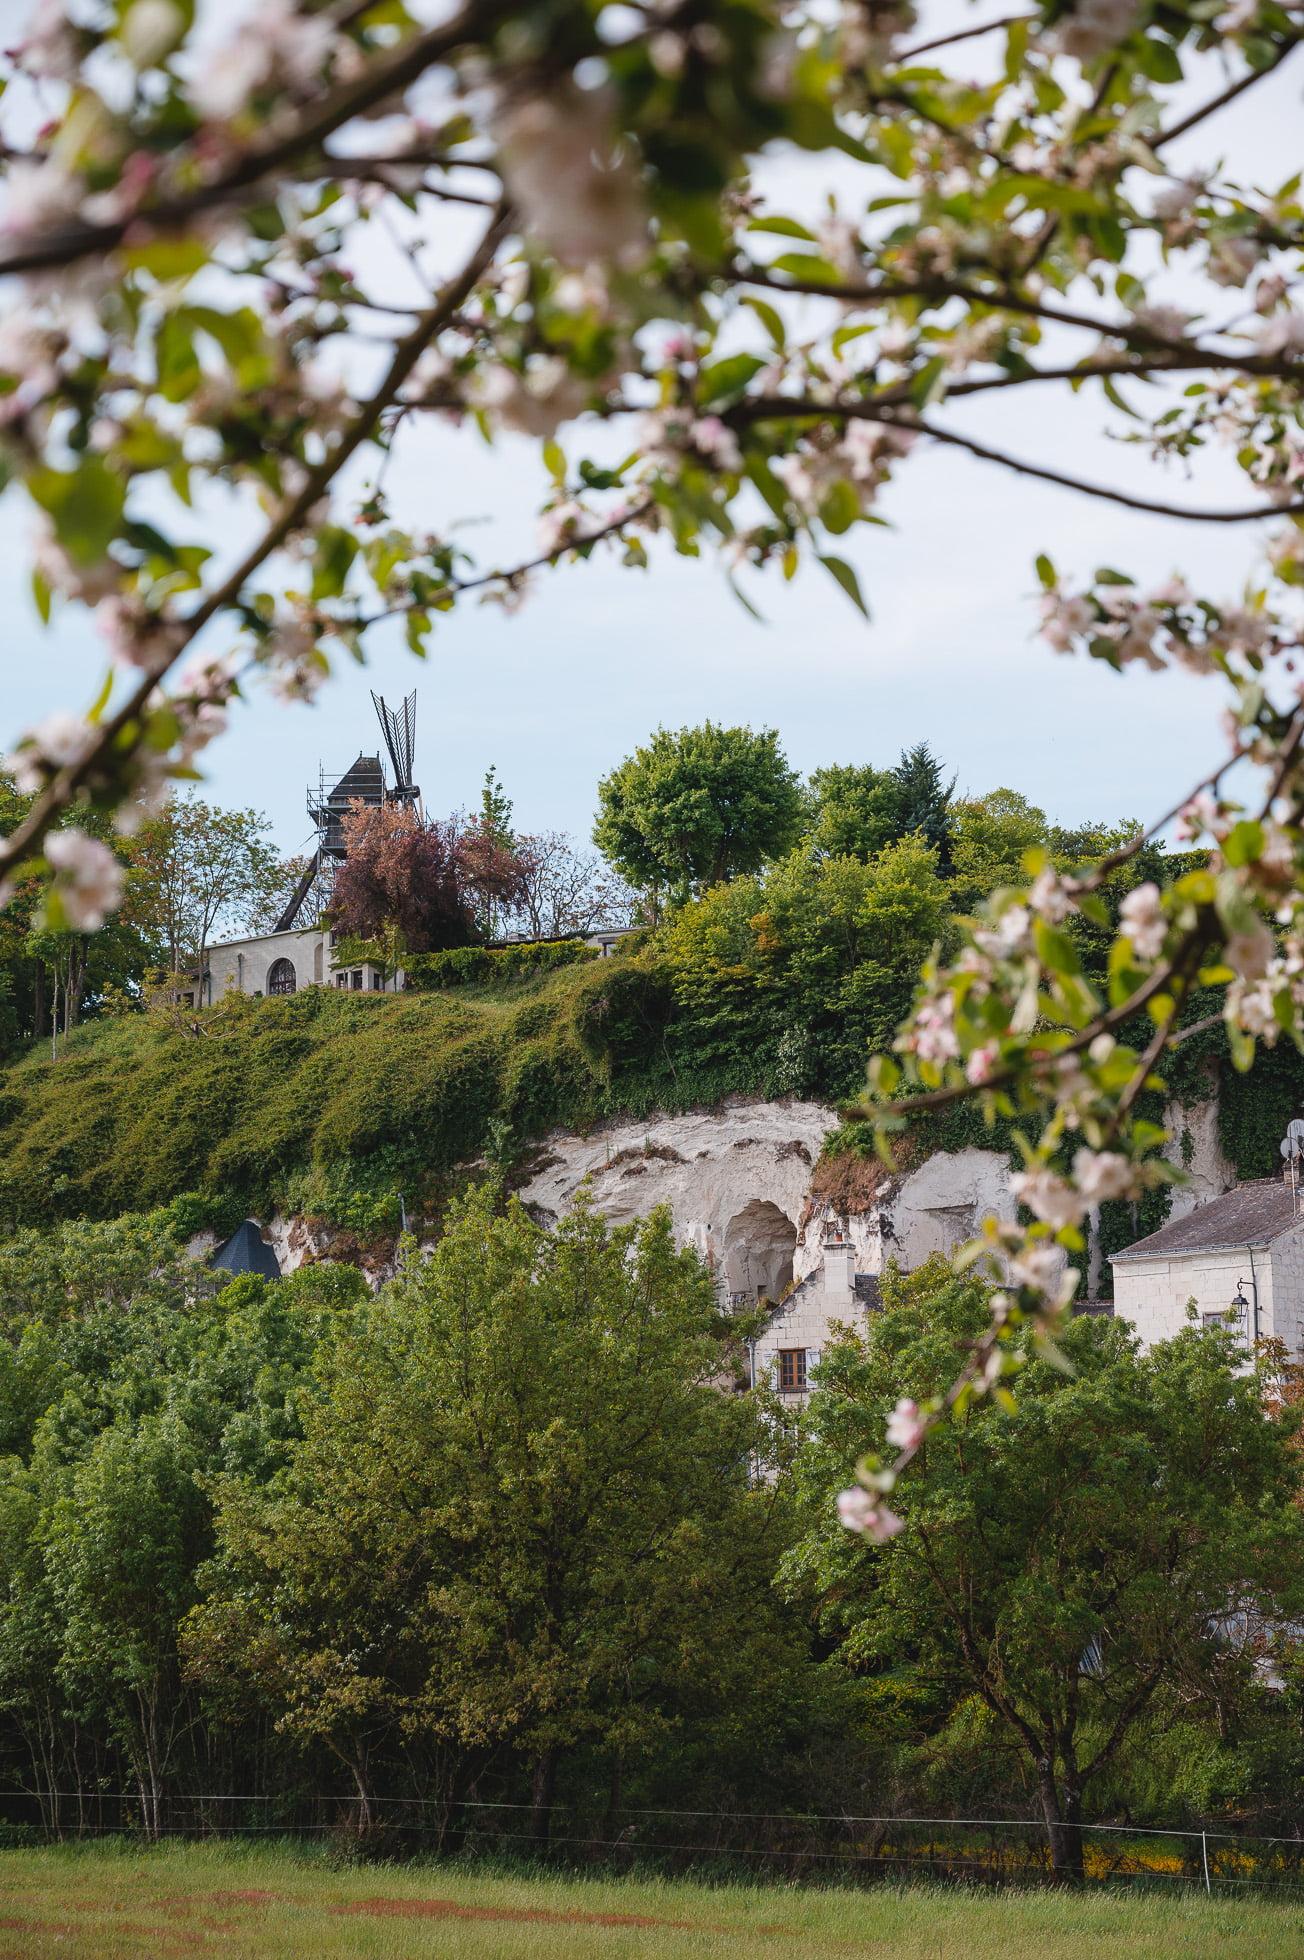 anjou 6000 - Les globe blogueurs - blog voyage nature